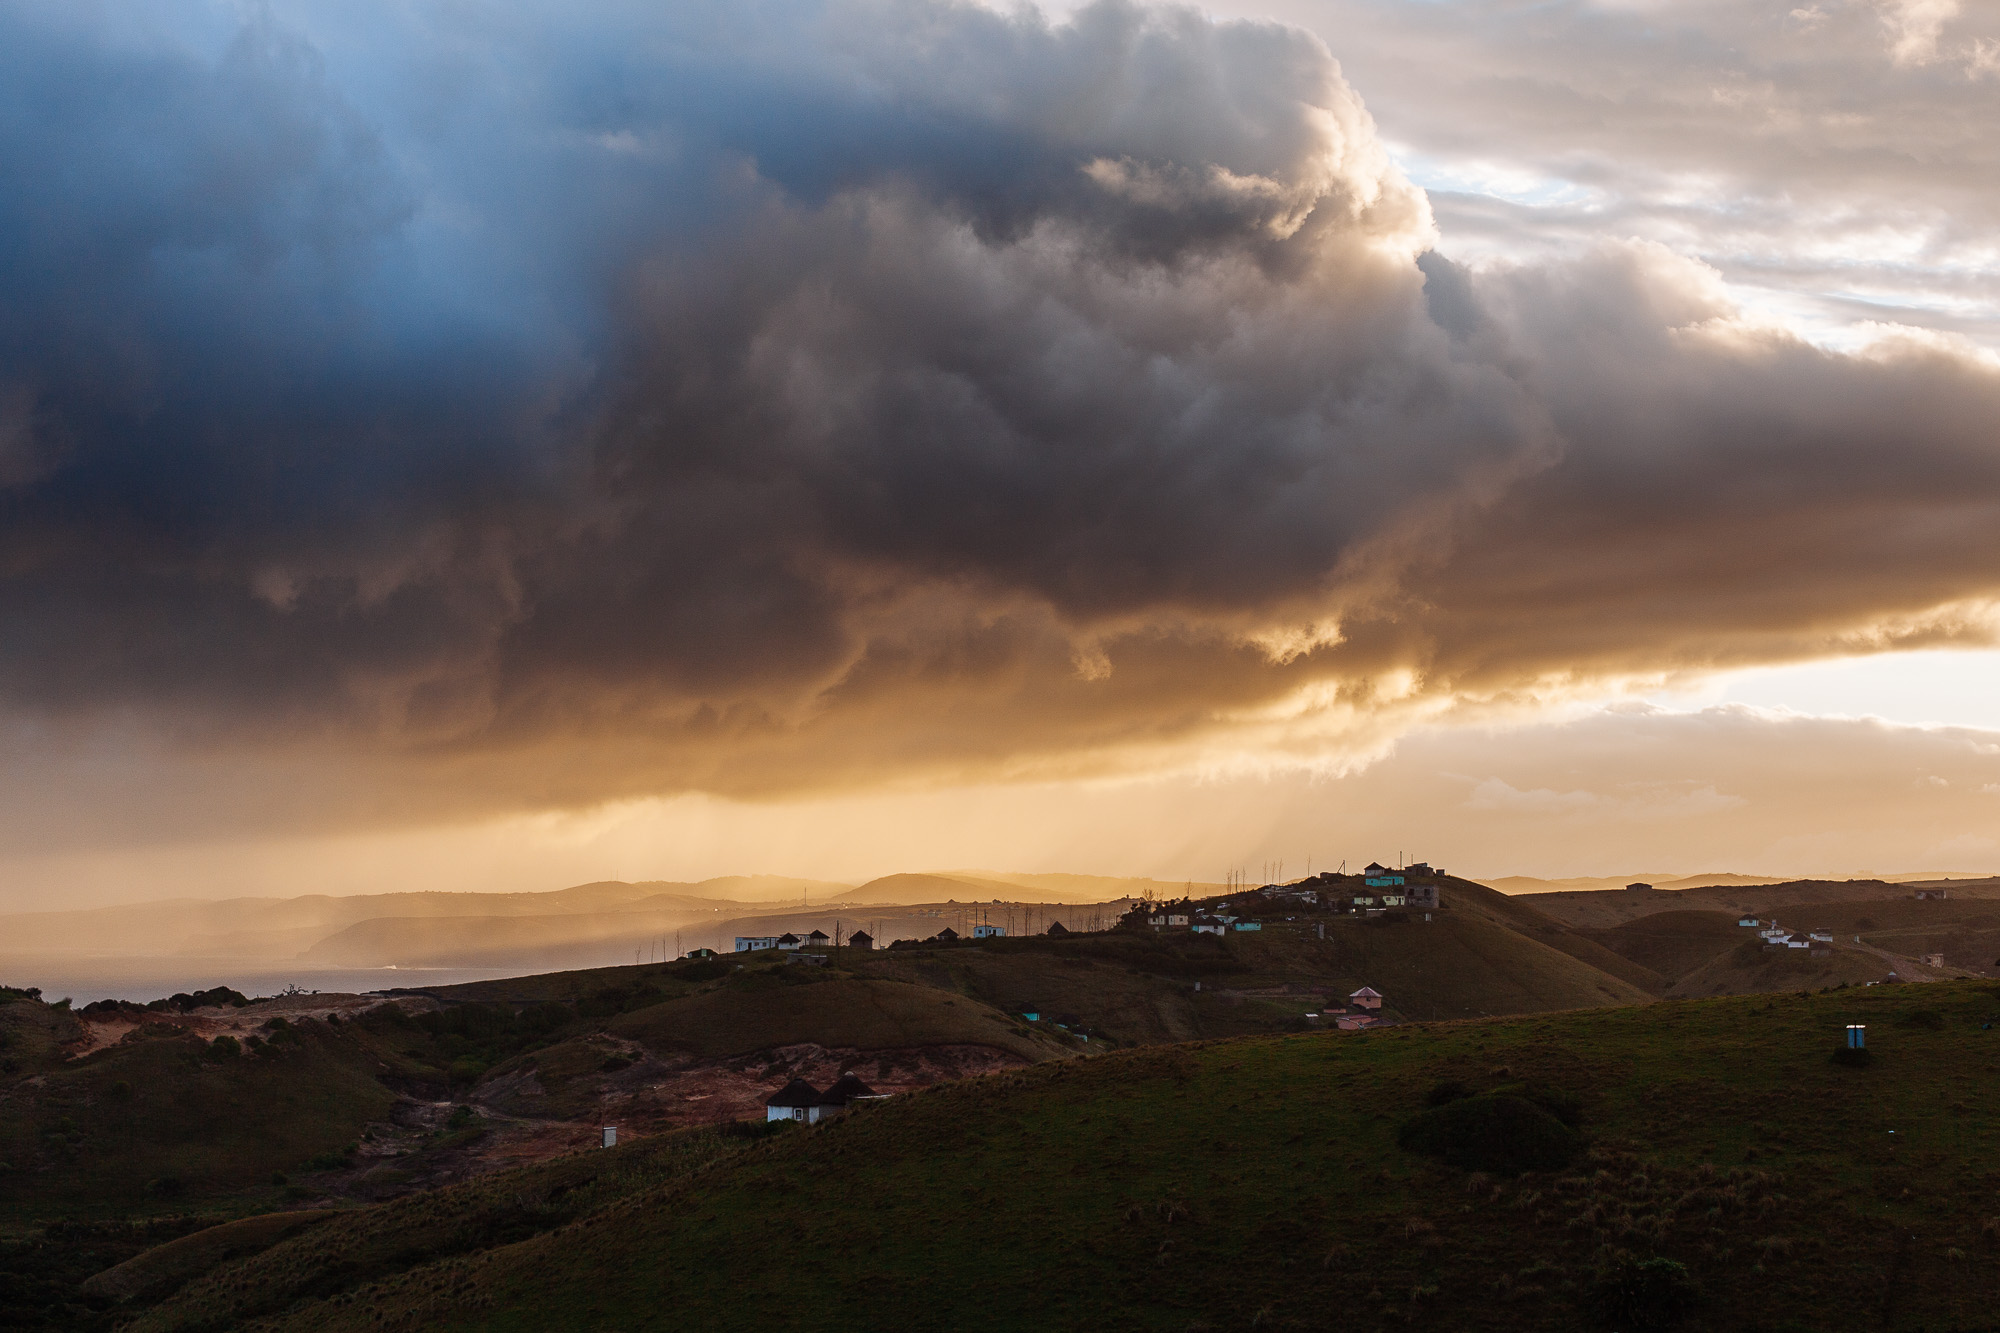 A storm rolls in across the village of Tshani.